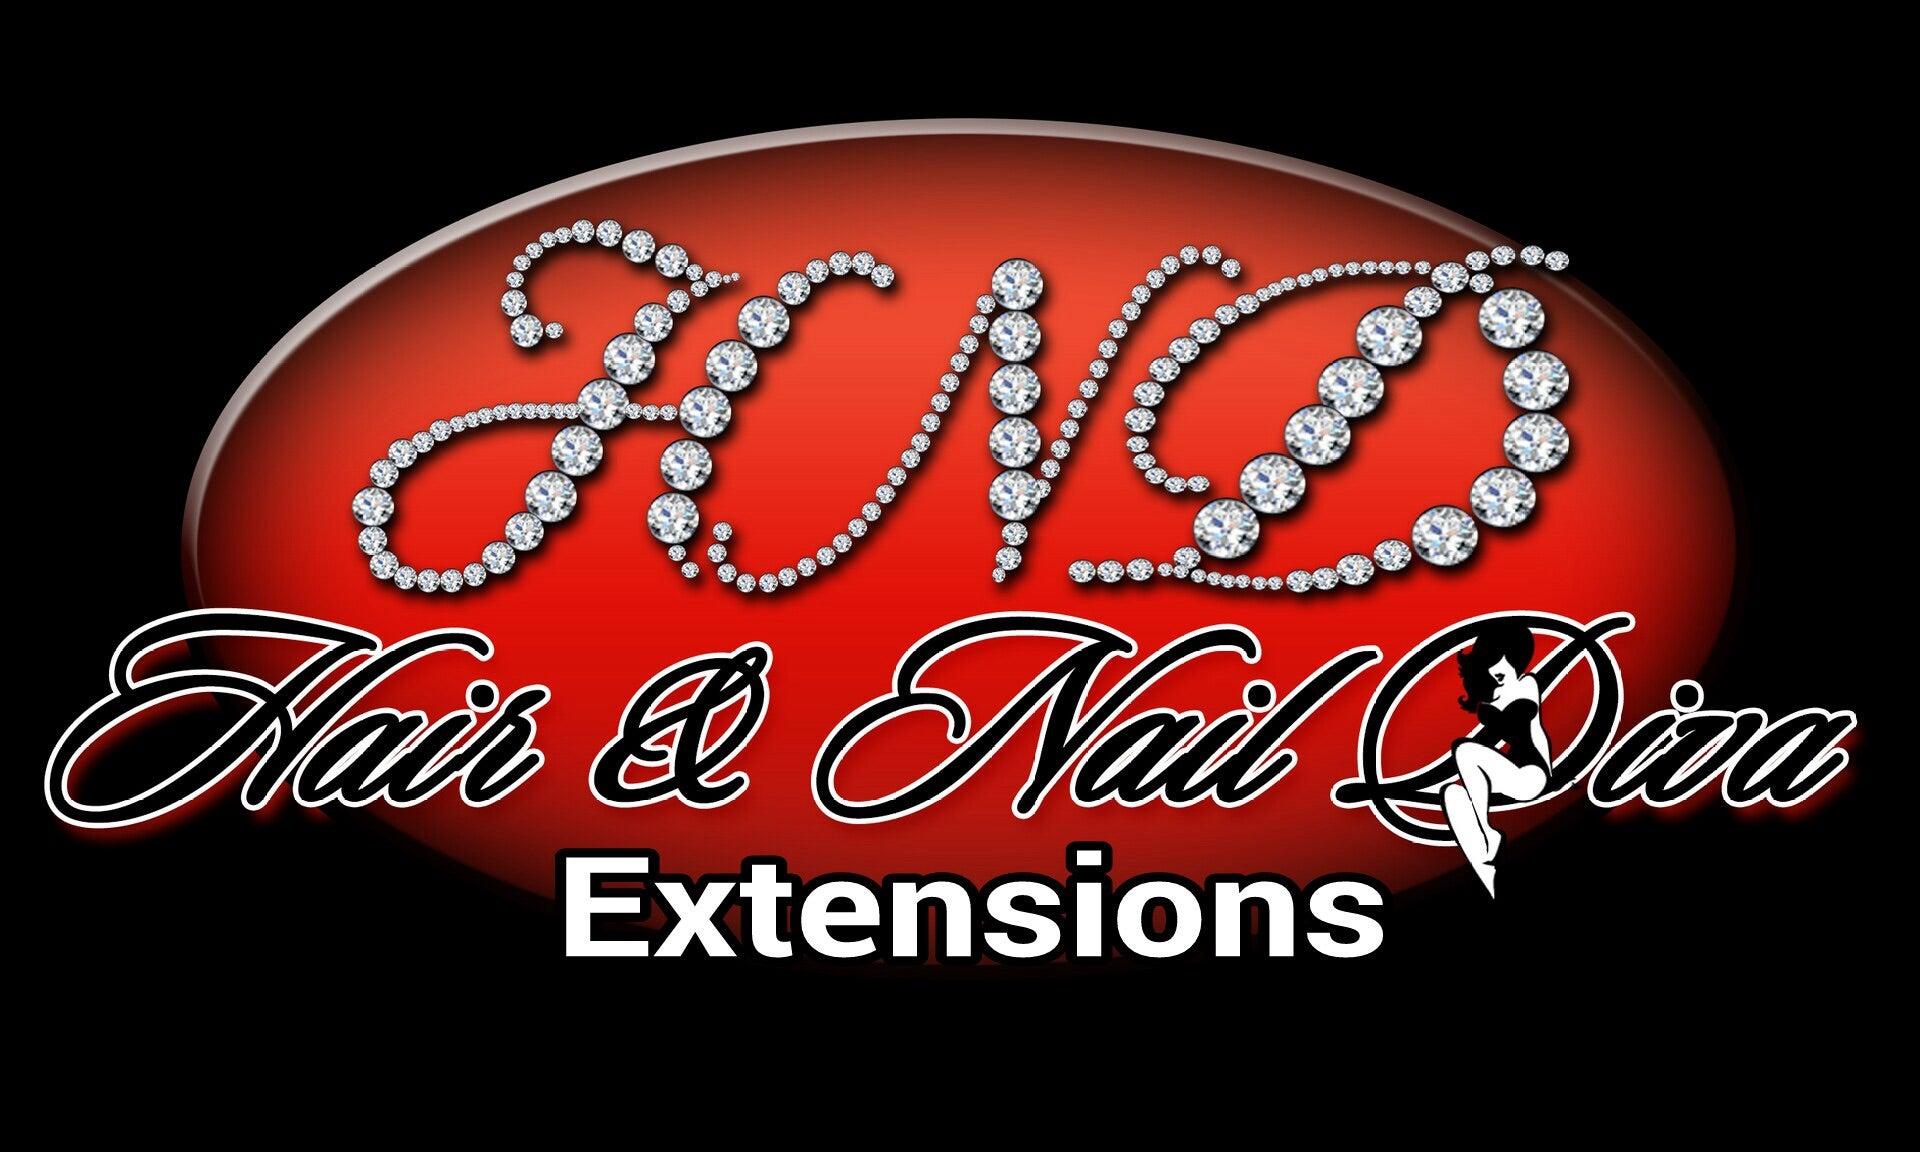 Hair & Nail Diva's Extensions